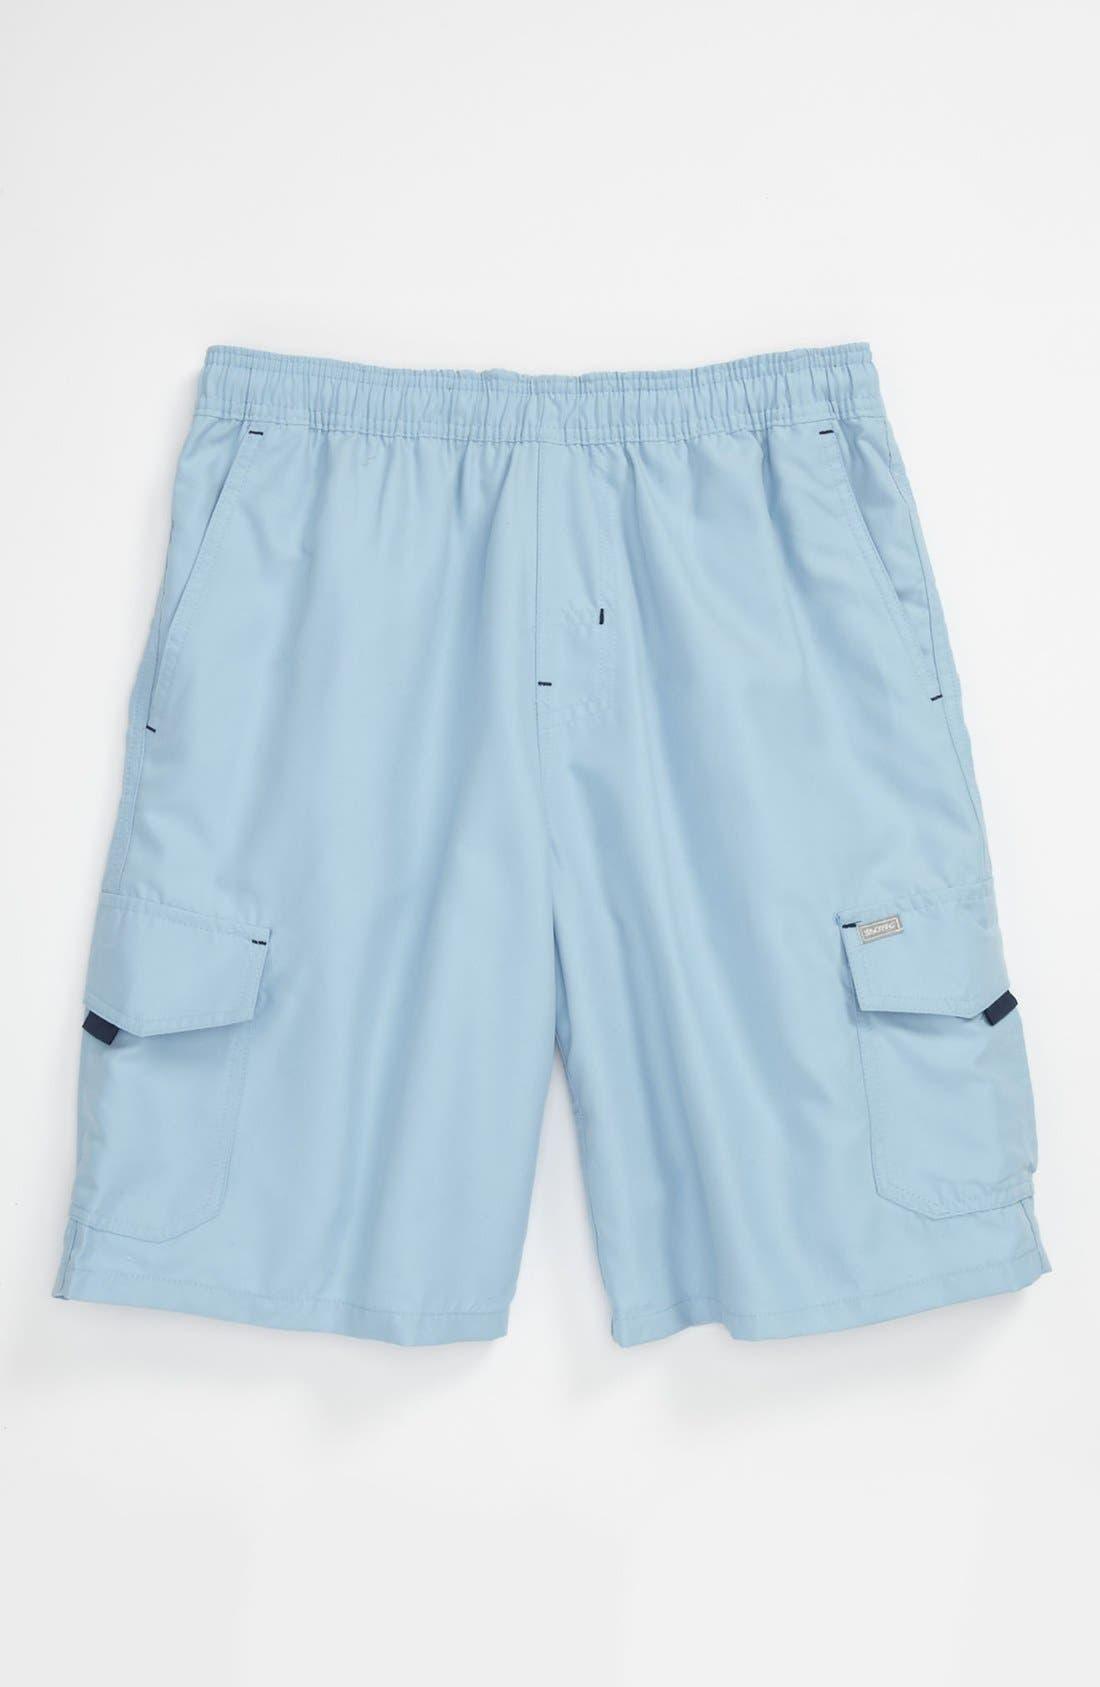 Alternate Image 1 Selected - Rip Curl 'Higgins' Shorts (Big Boys)